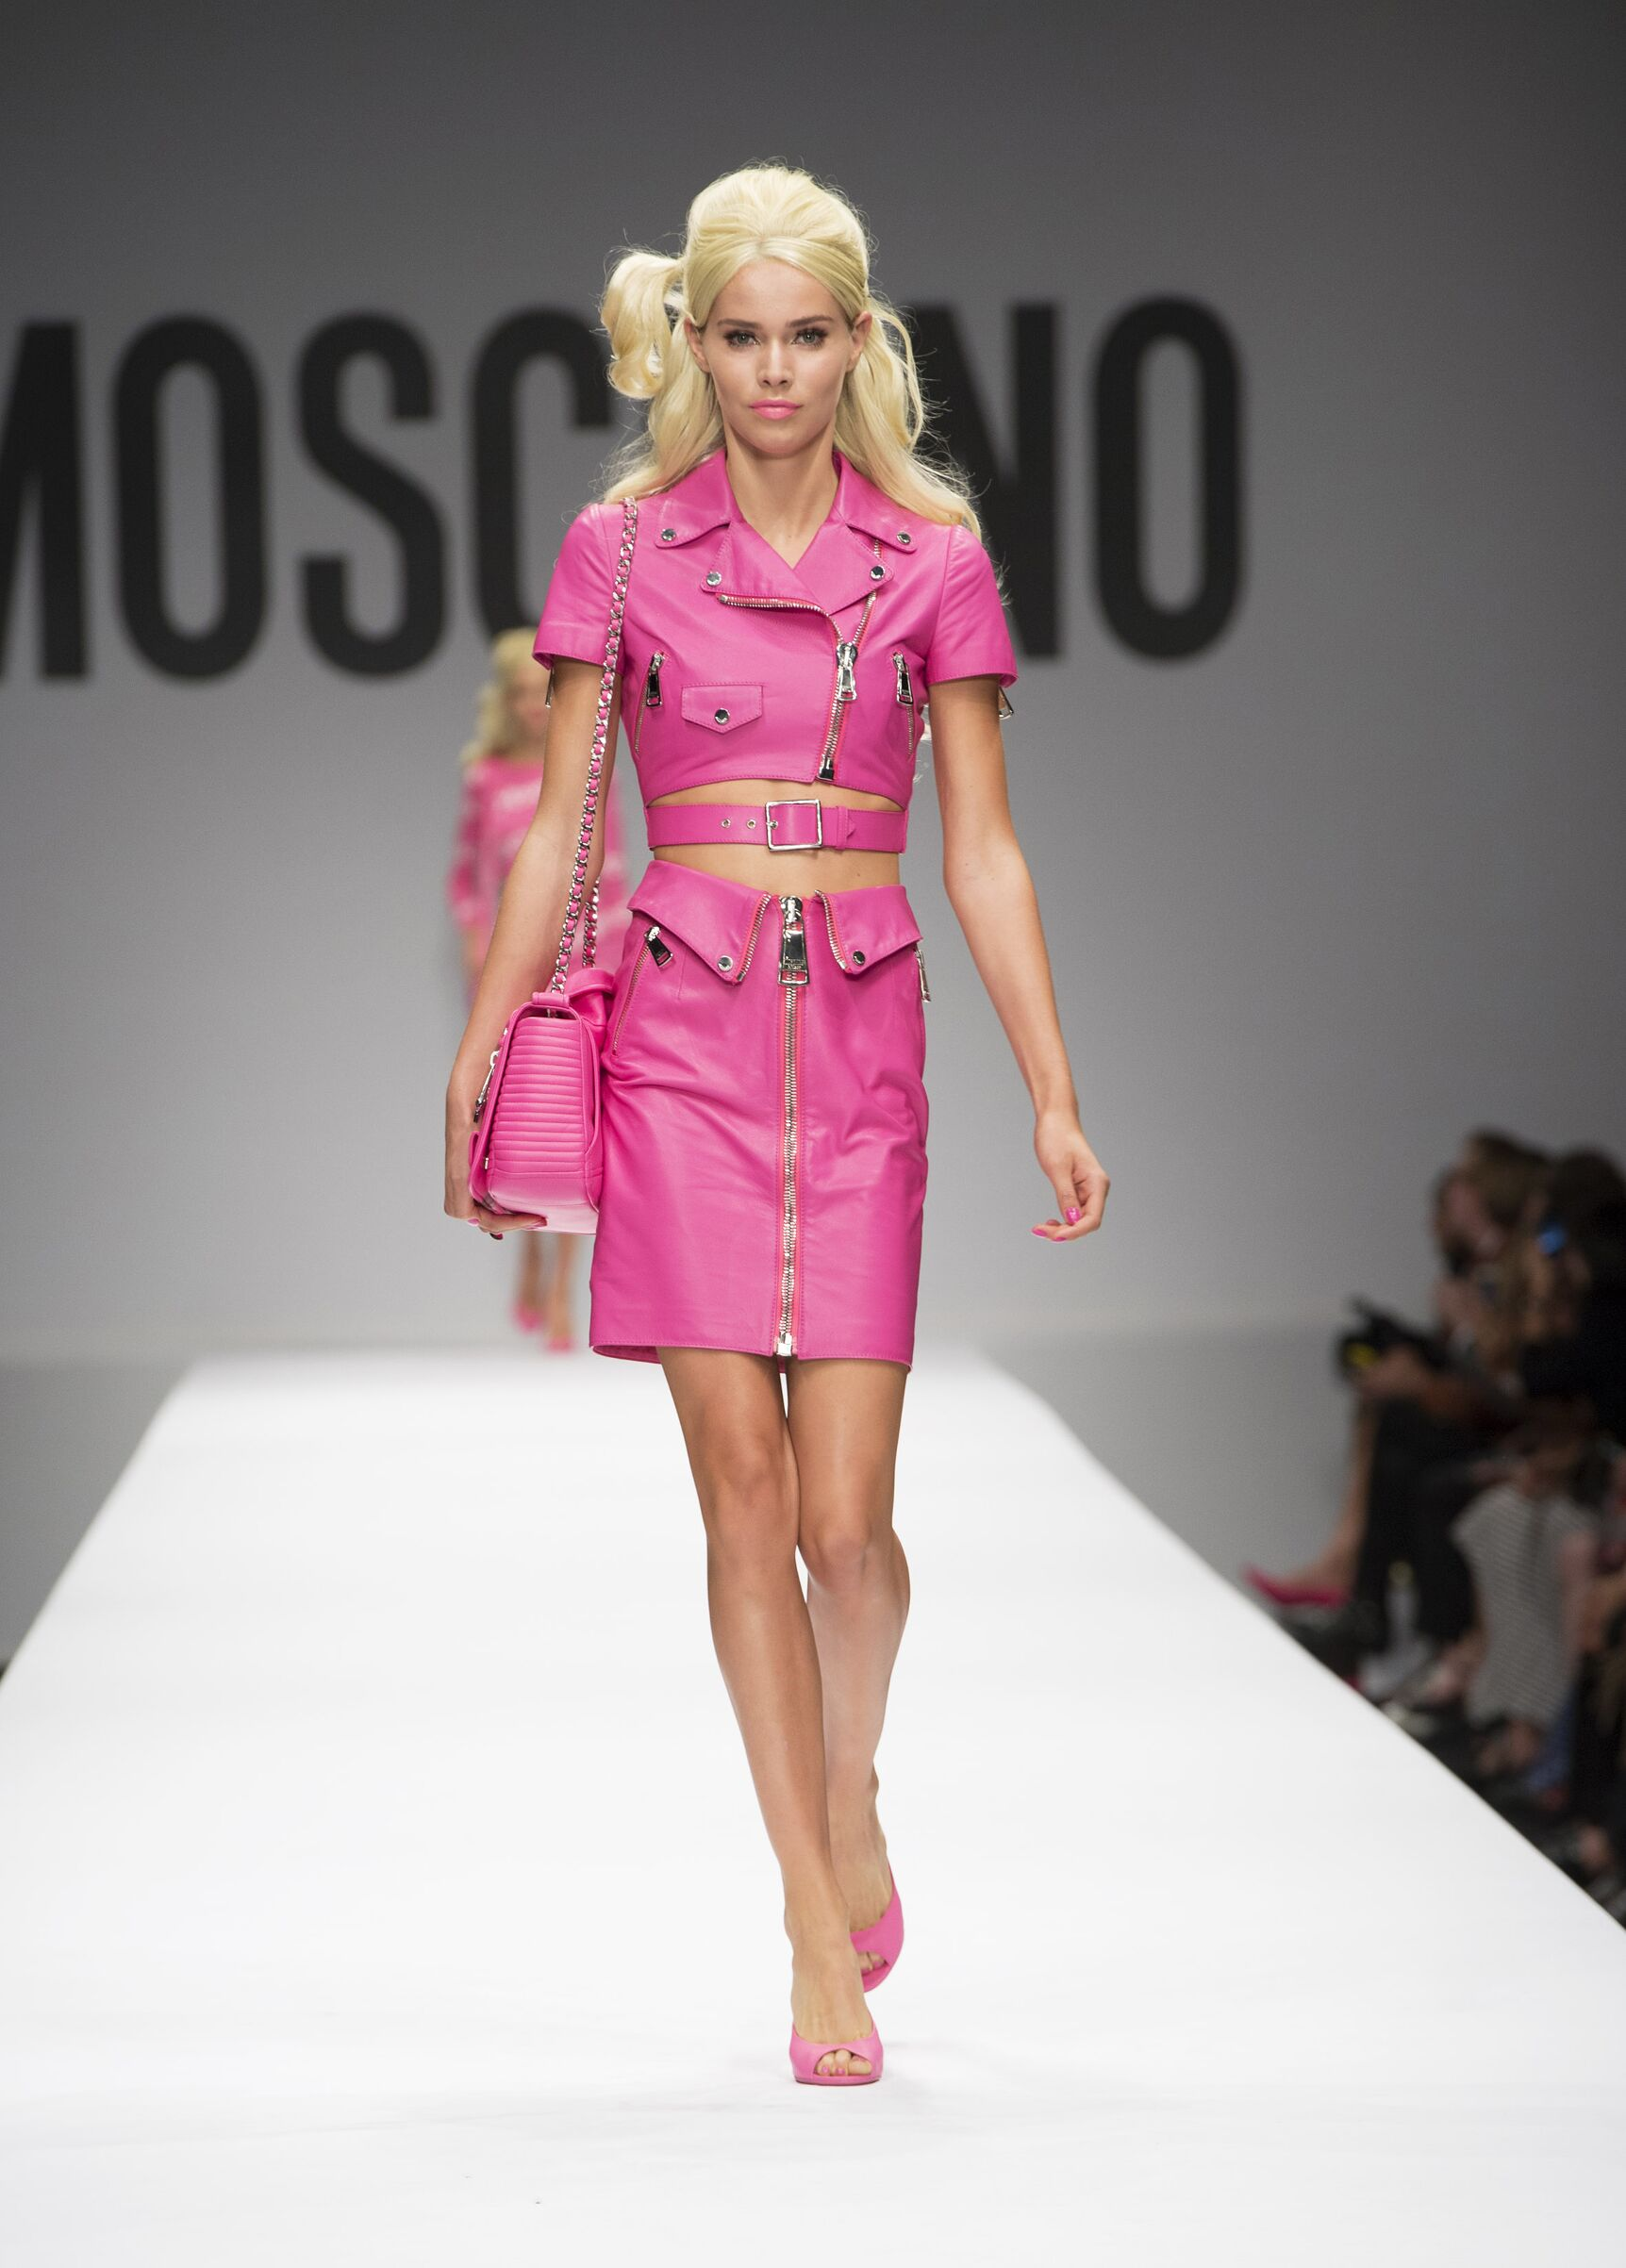 Moschino Woman Milan Fashion Week Barbie